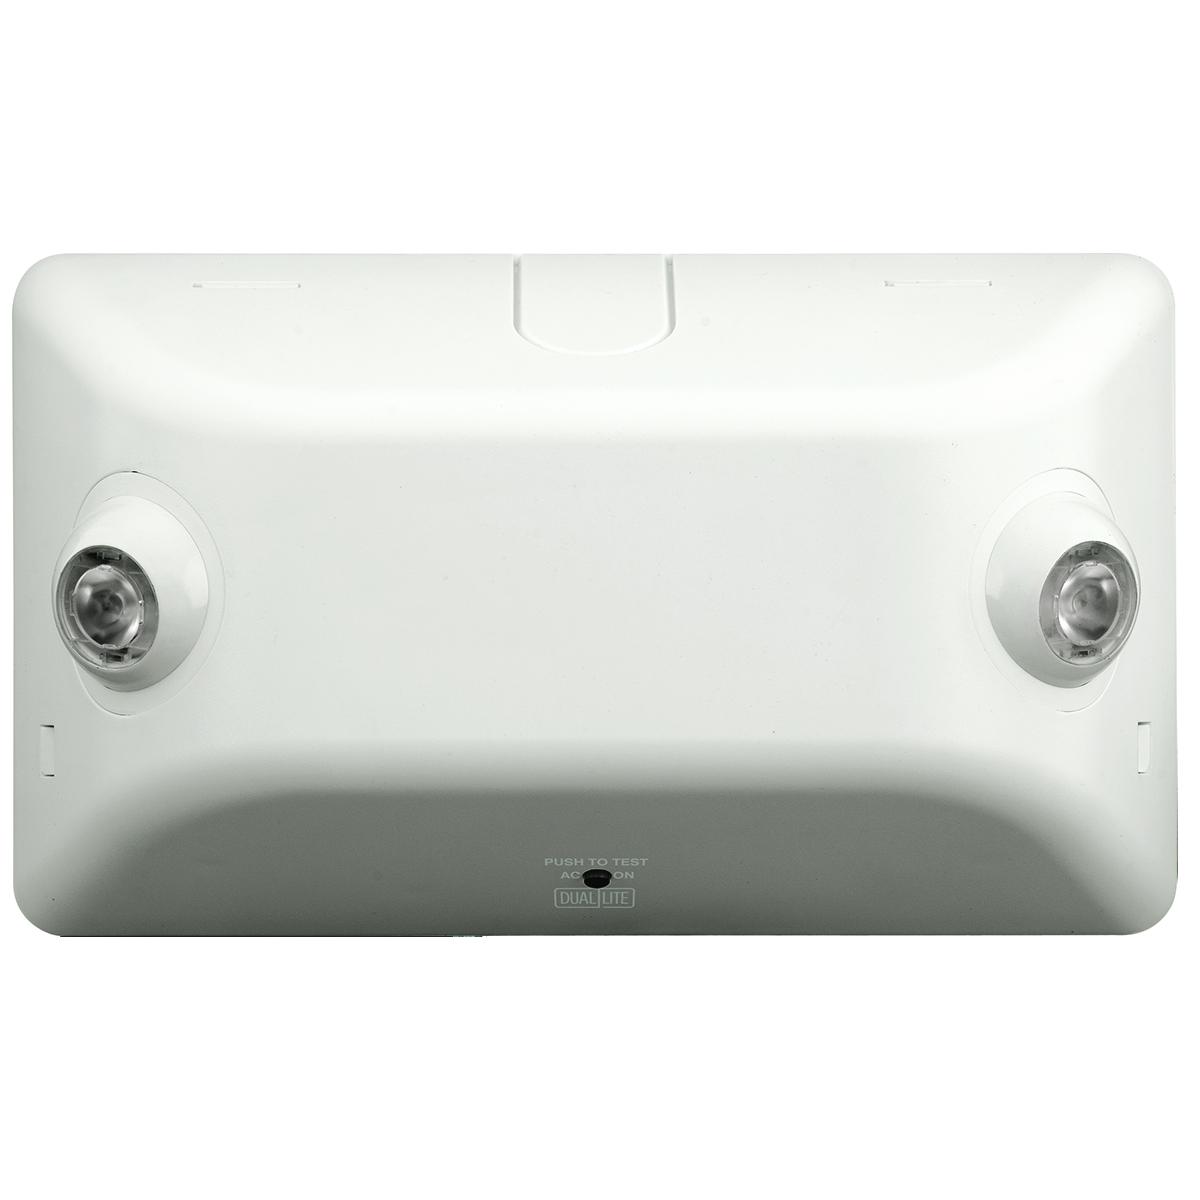 Dual-Lite,EV4D,Dual-Lite® EV4D Architectural Emergency Light Fixture, 2.75 W LED Lamp, 120 to 277 VAC, 2 Heads, Thermoplastic